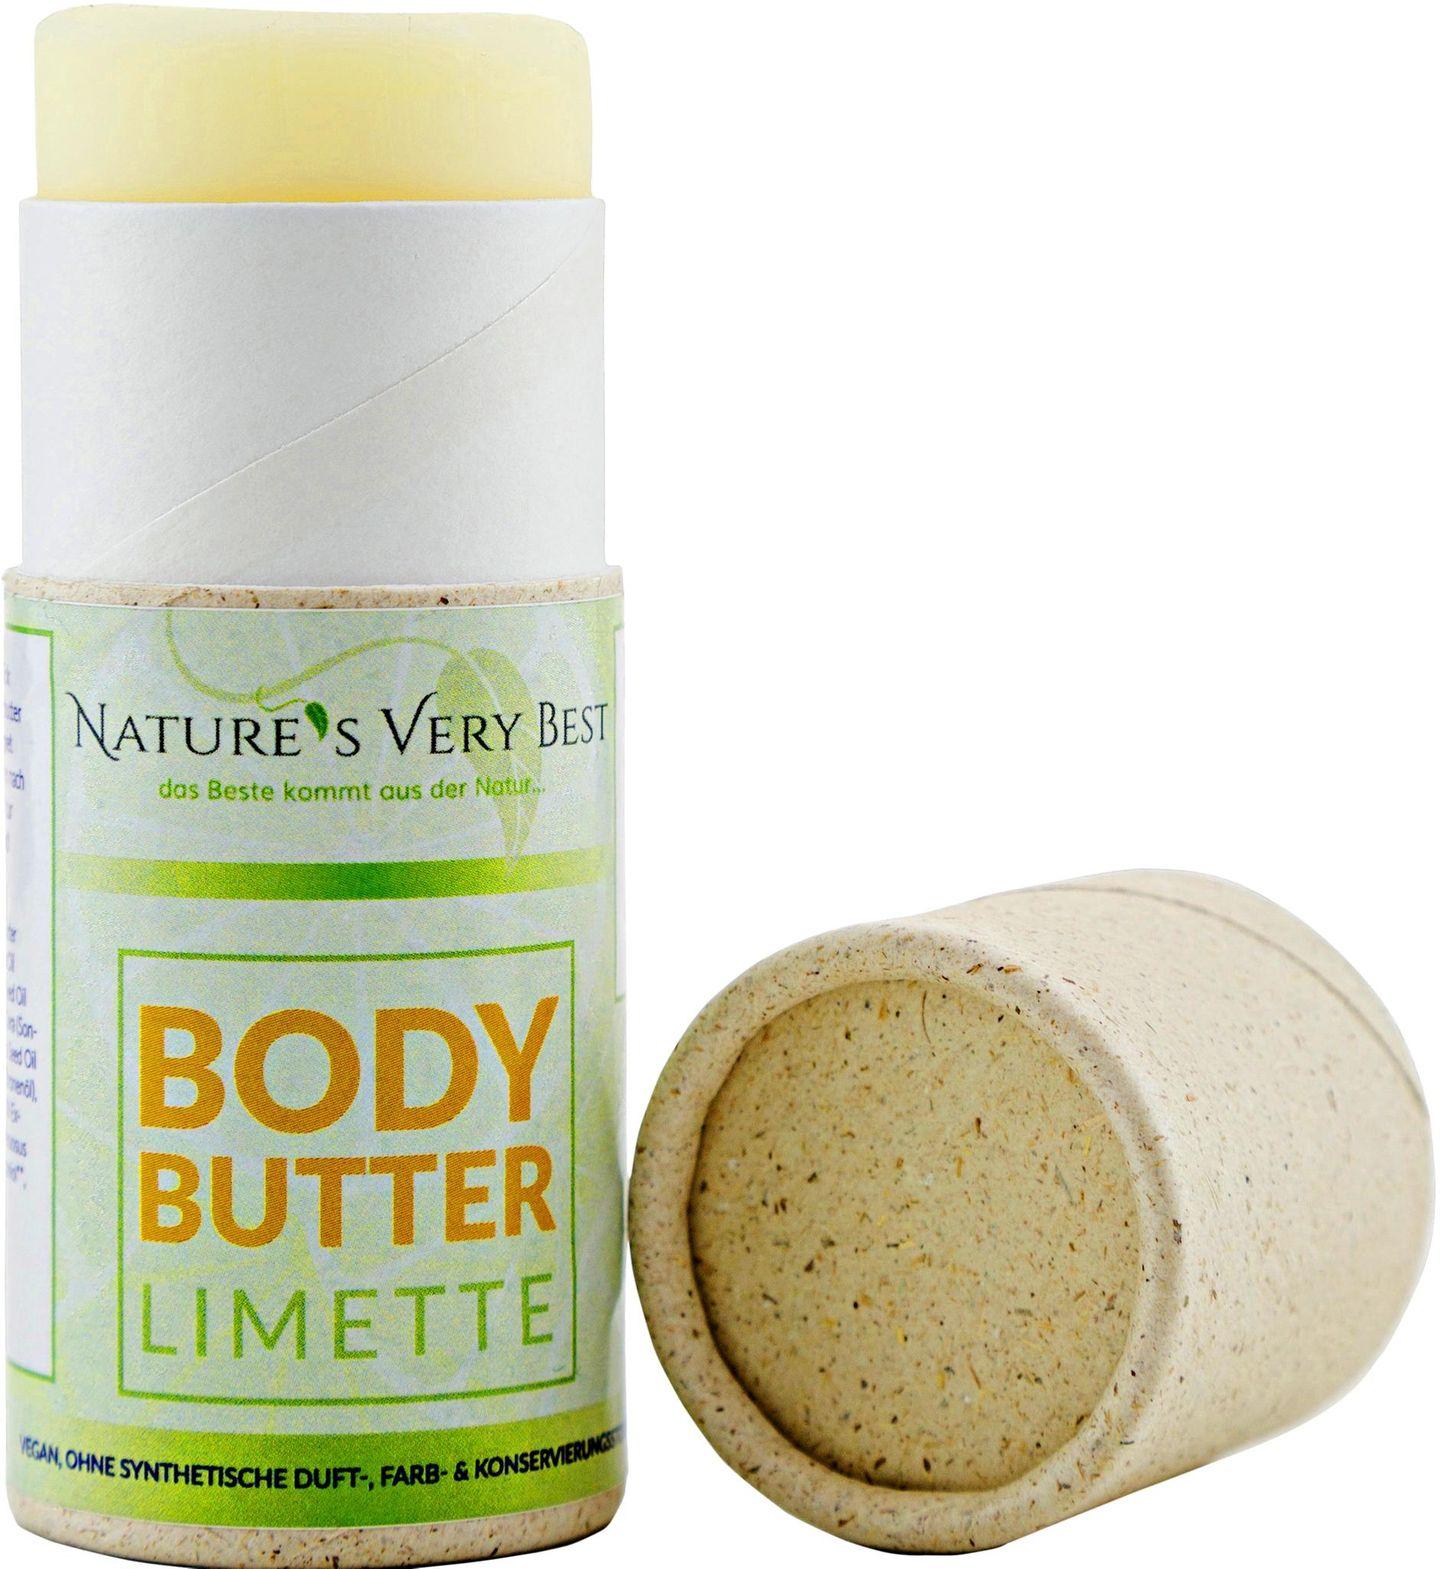 Vegan Beauty: Body Butter